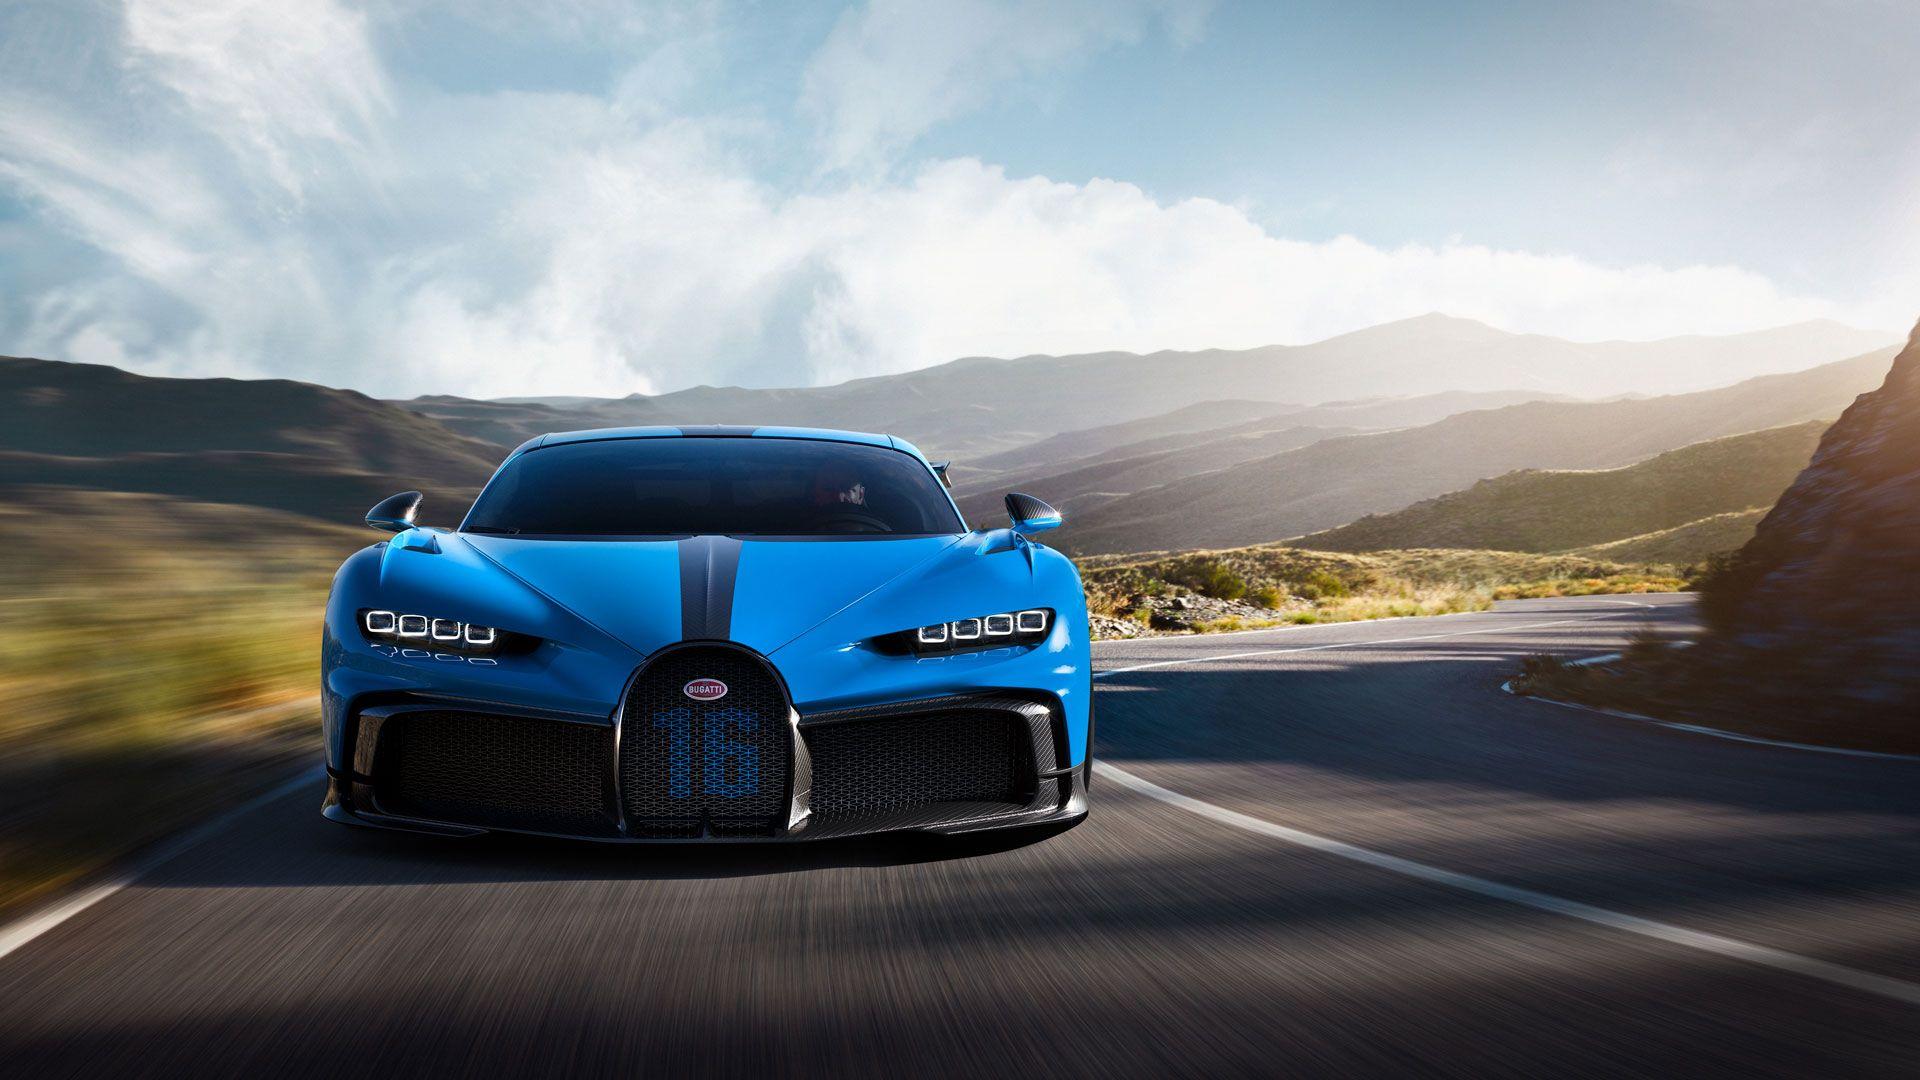 bugatti-chiron-pur-sport-dynamic-12